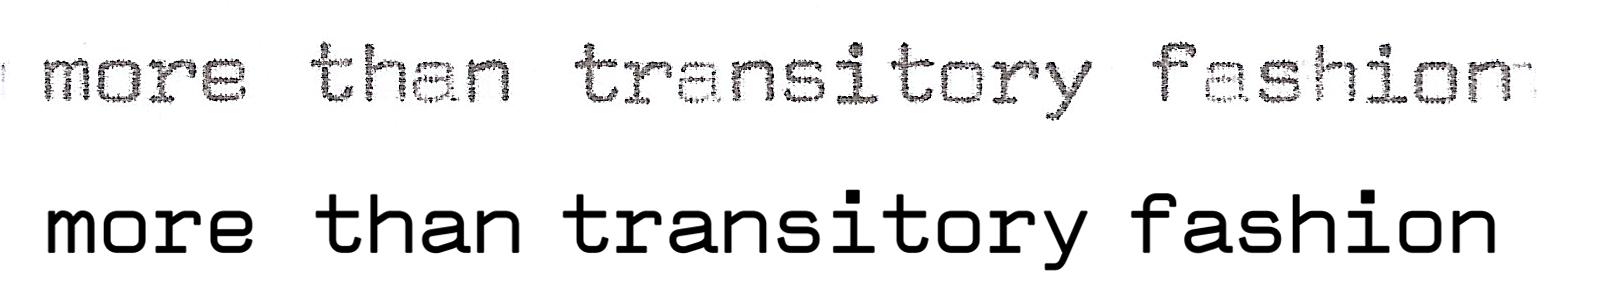 Comparison between Quadrato (Arturo Rolfo, 1963) and Valentine (Stephan Müller, 2002).